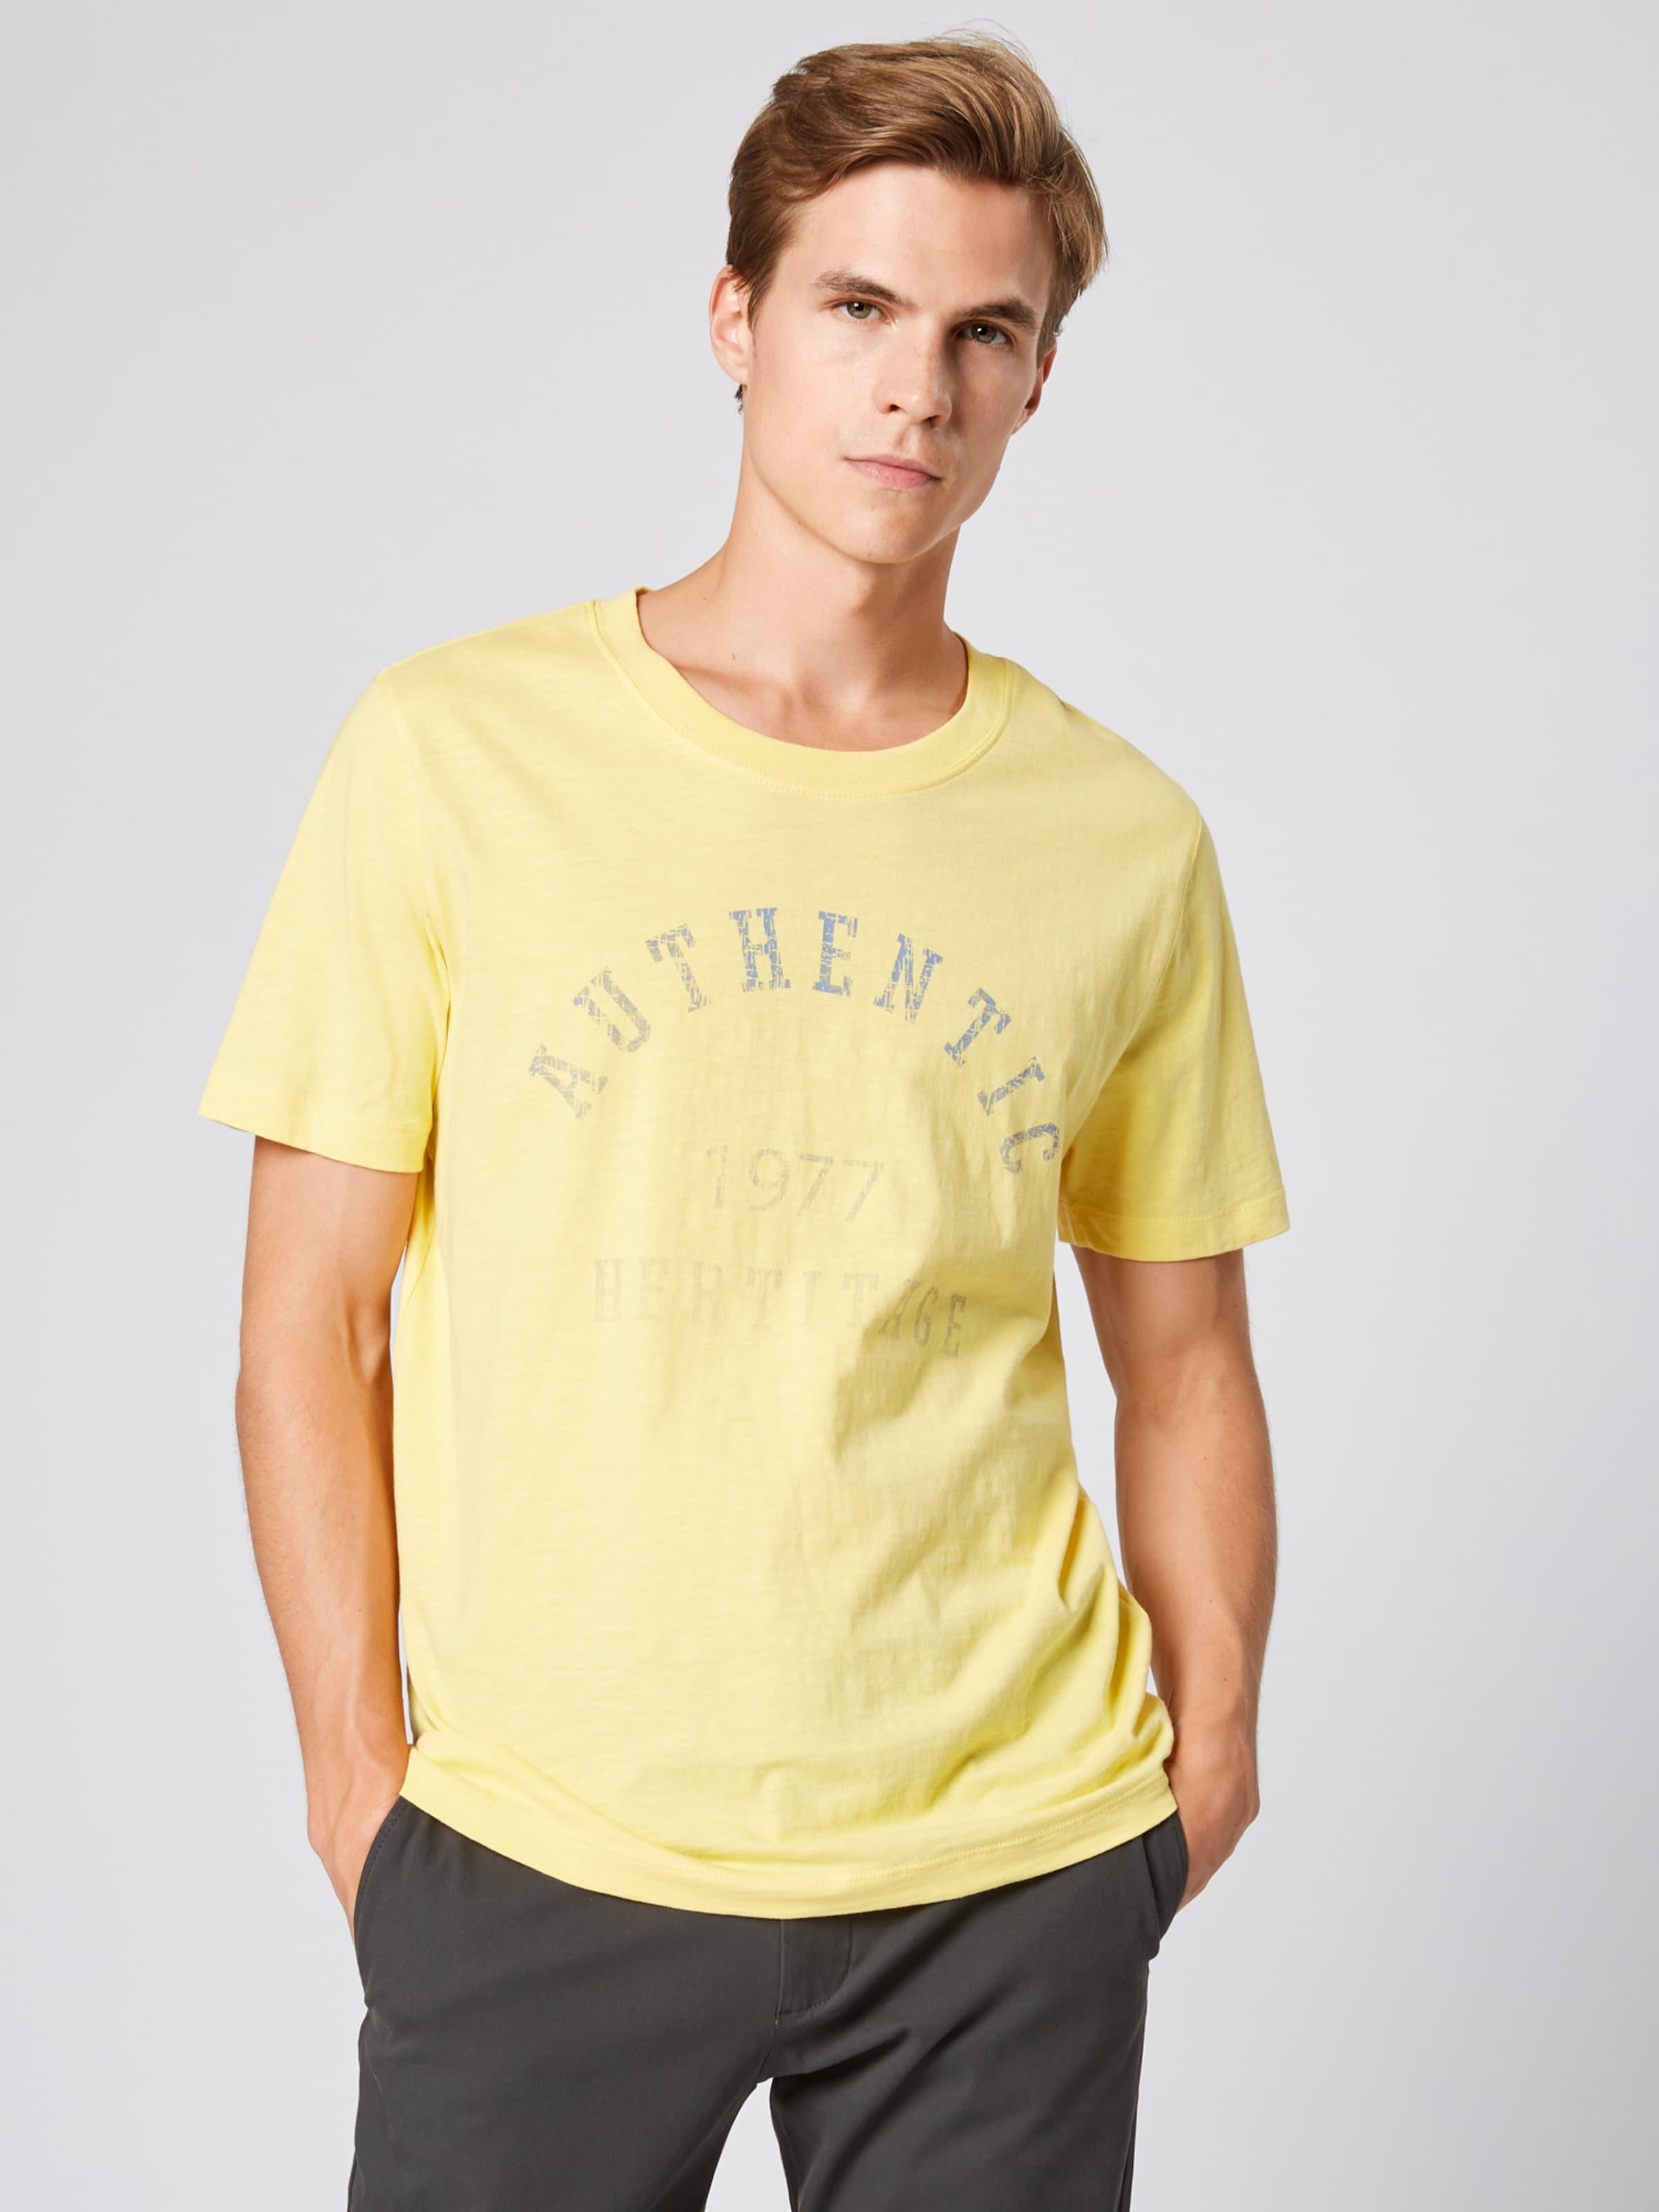 Active T Pétrole shirt En Camel bgym7IYfv6